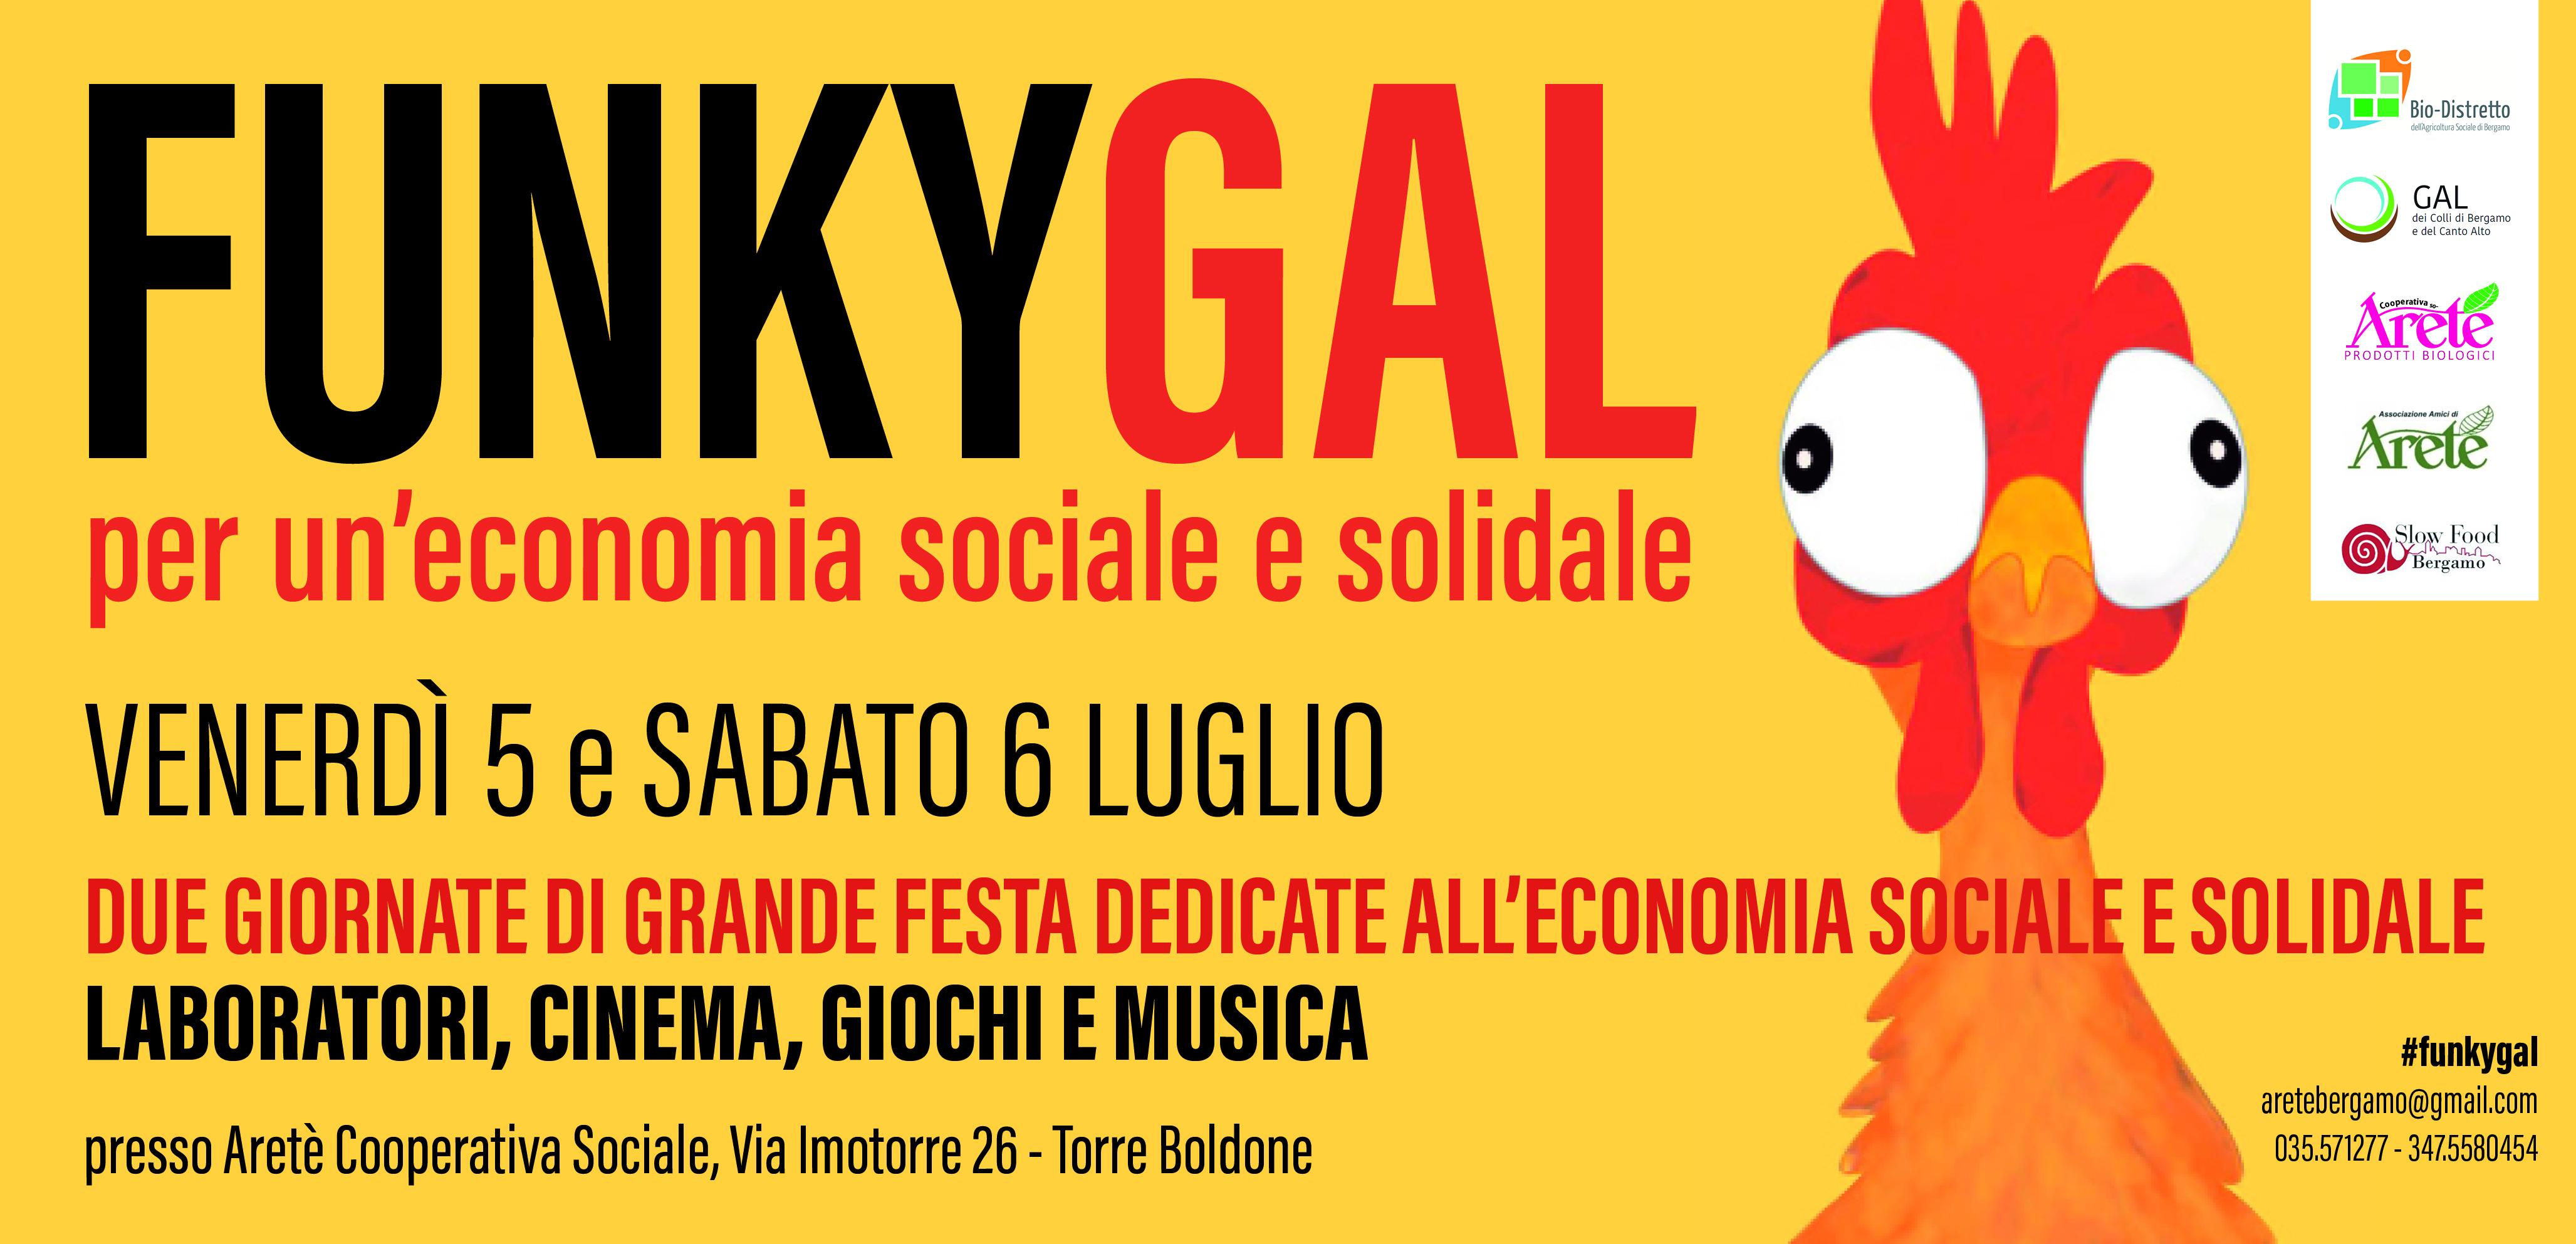 Funky Gal – banner – economia sociale e solidale